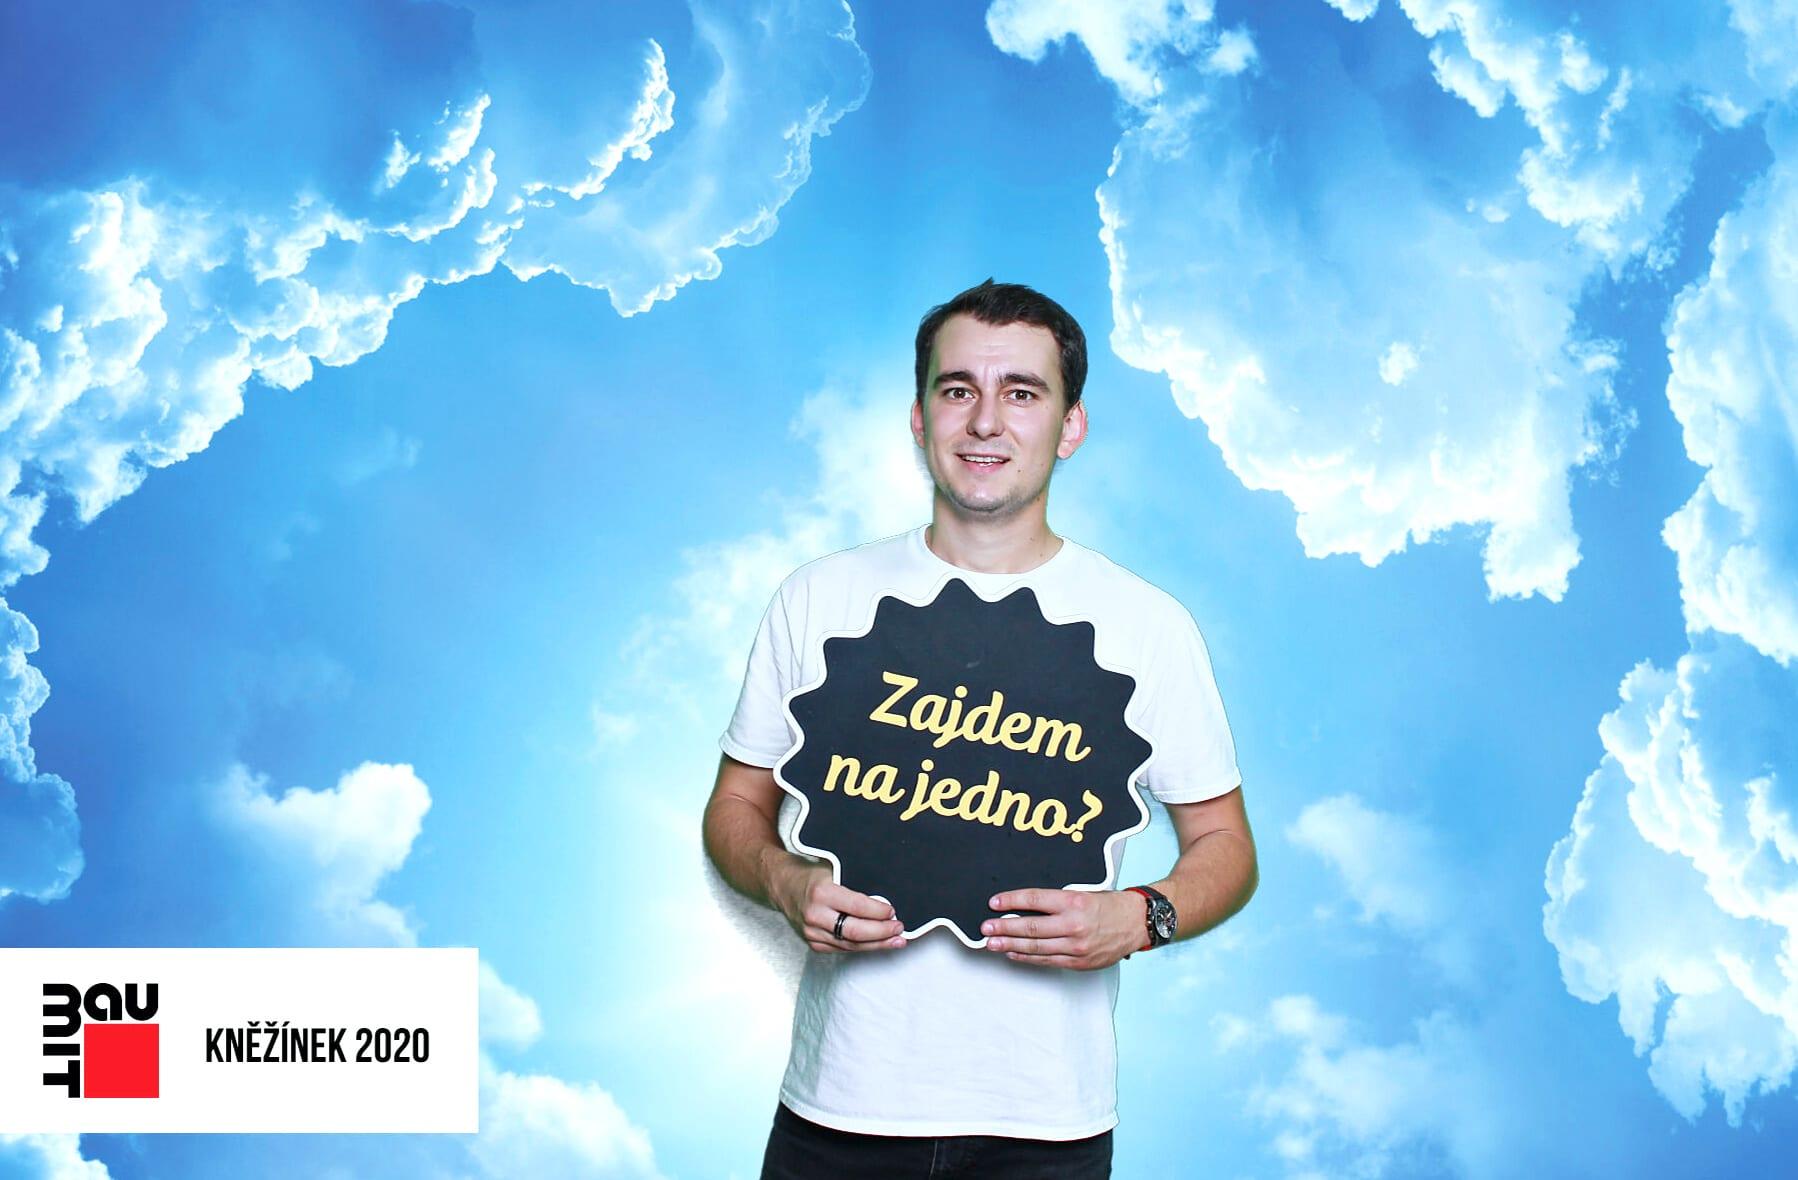 fotokoutek-ceske-budejovice-firemni-vecirek-baumit-24-9-2020-731643